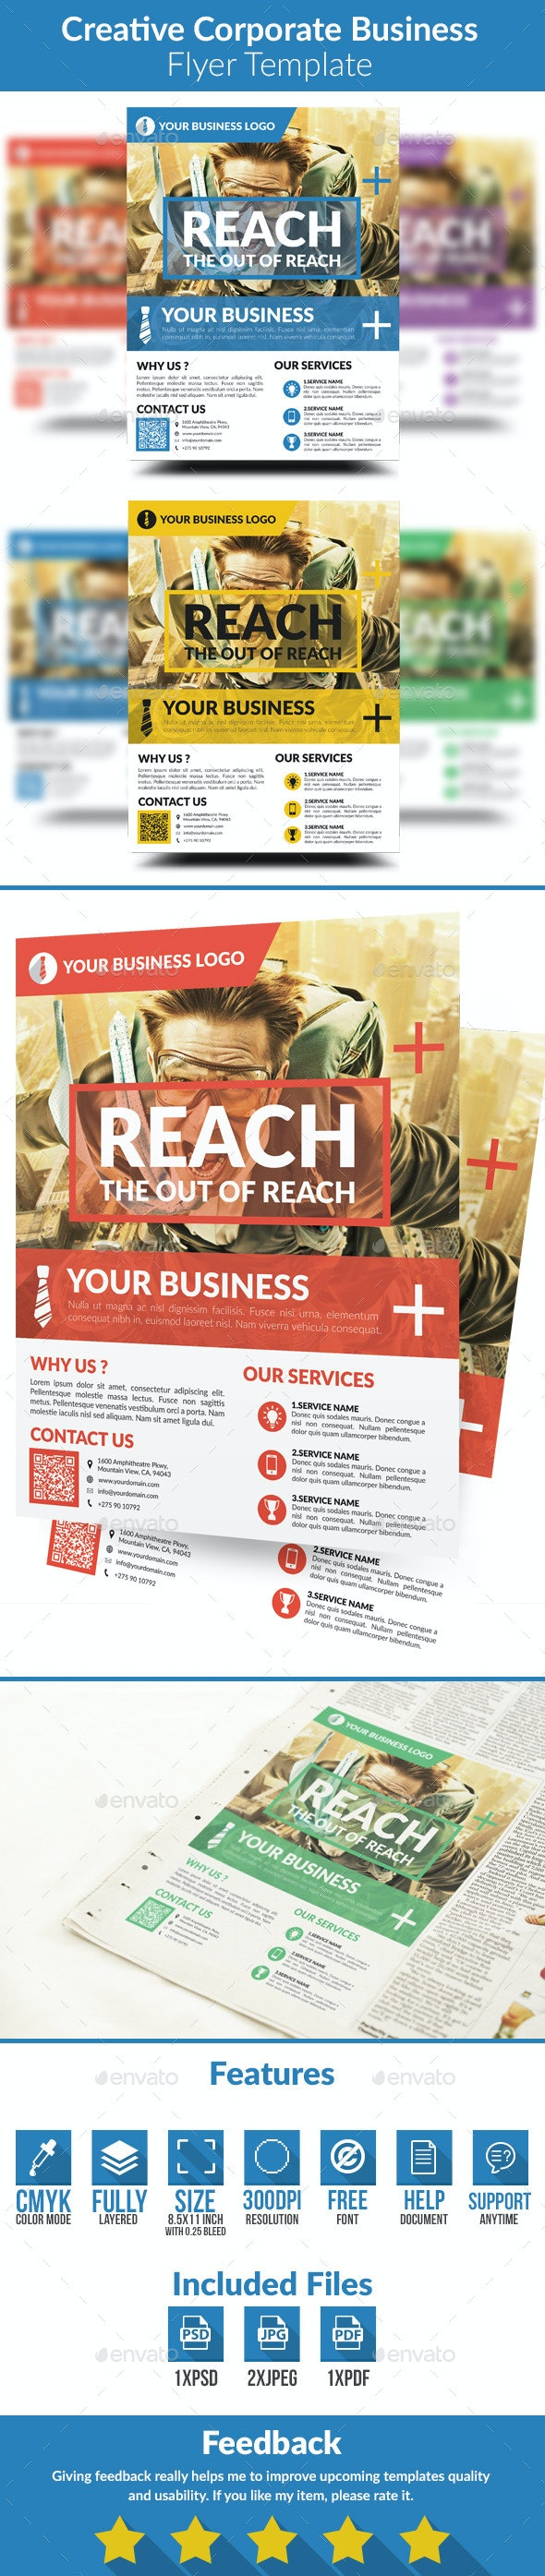 Creative Corporate Business Flyer - Corporate Flyers